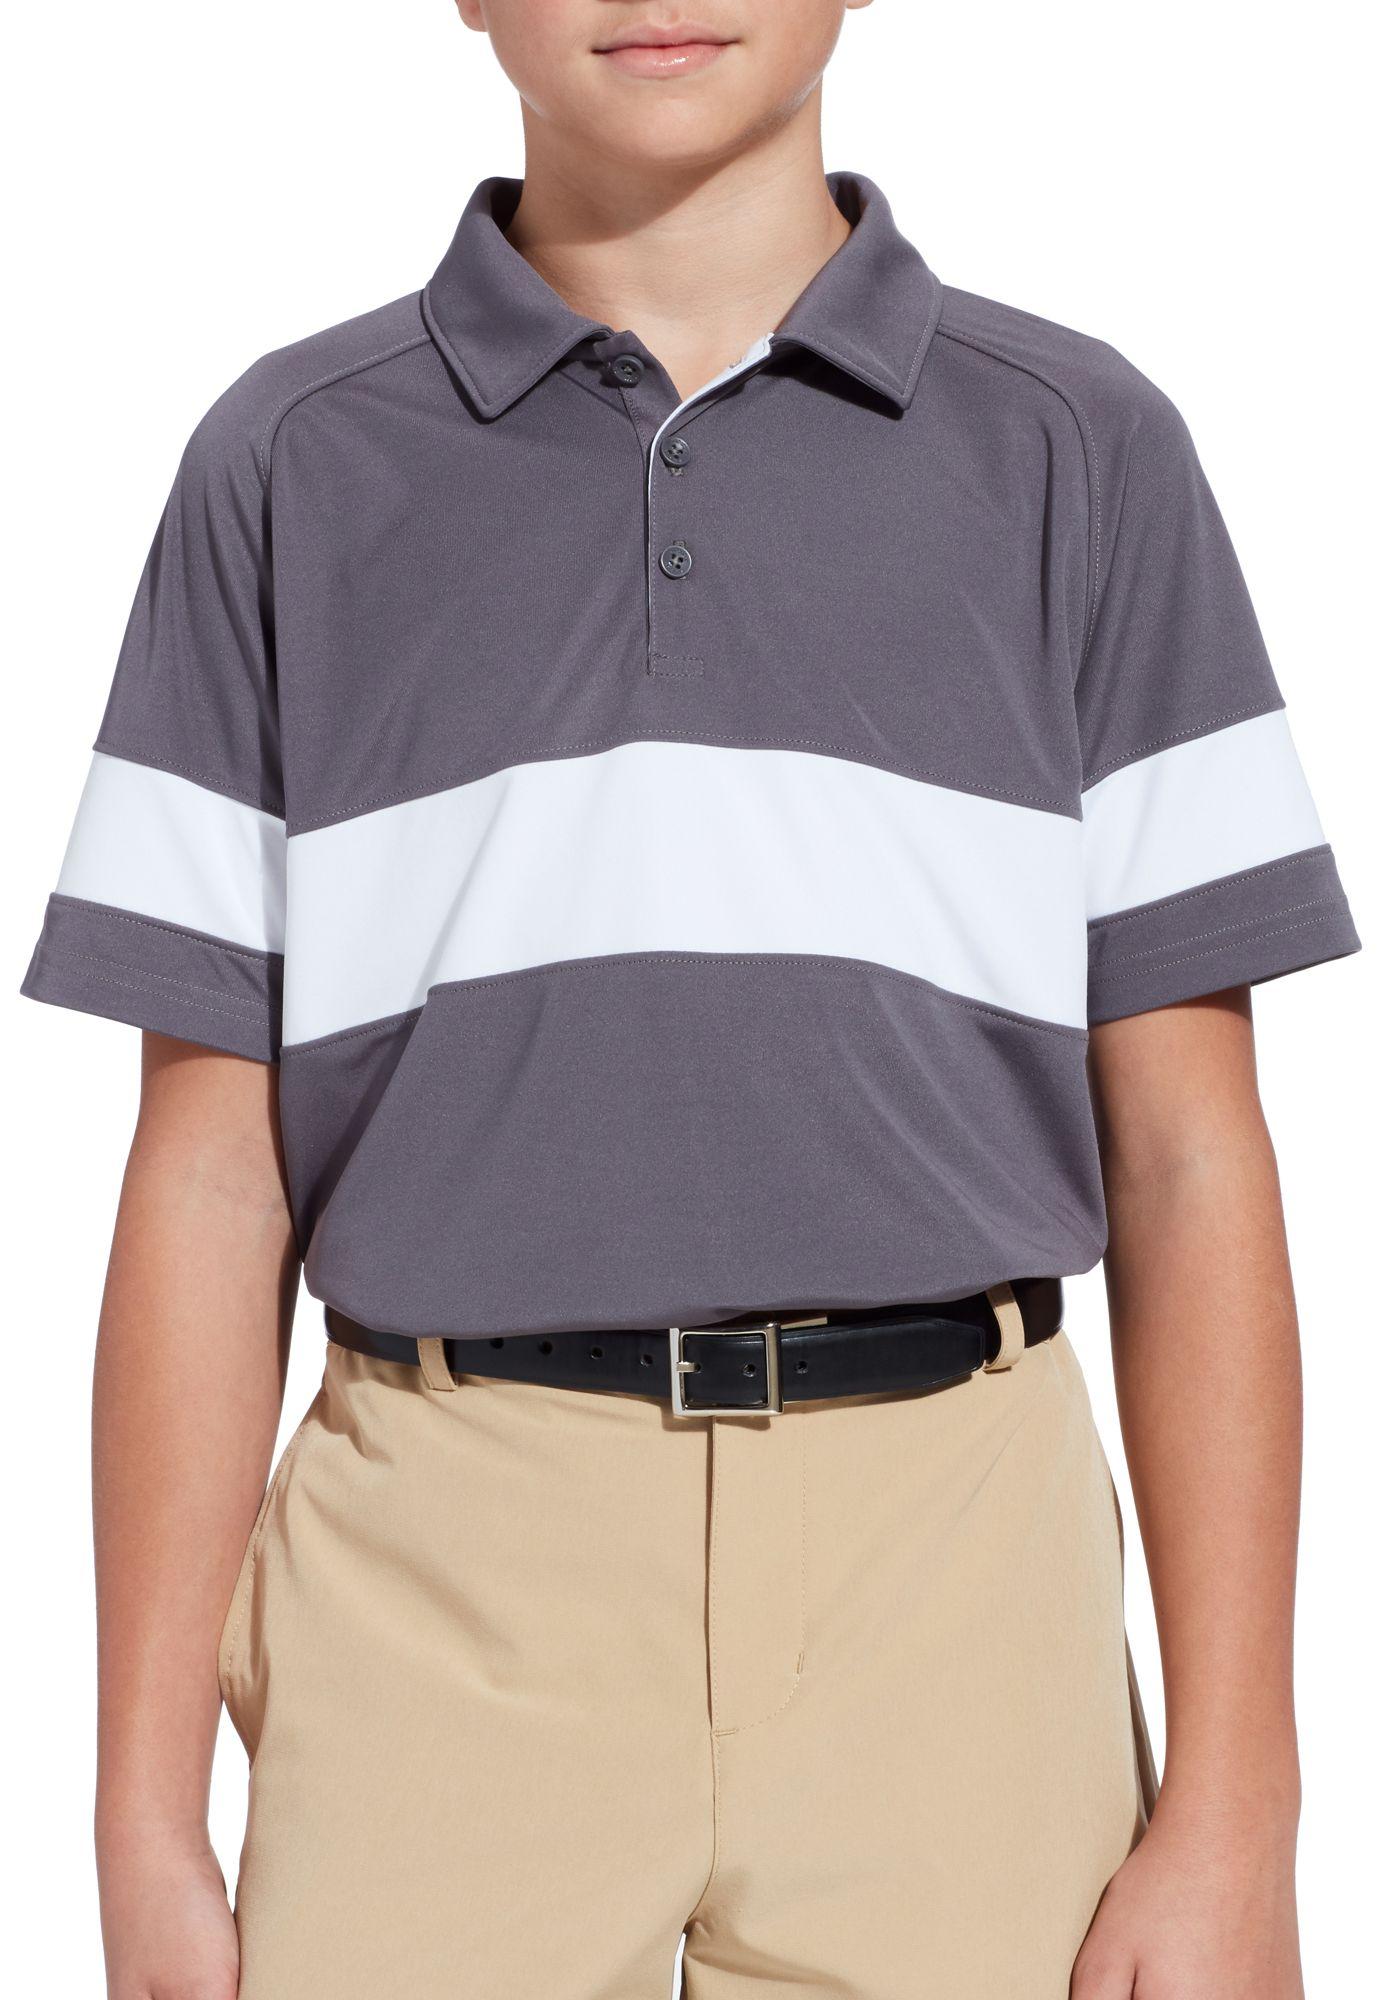 Slazenger Boys' Solid Colorblock Golf Polo